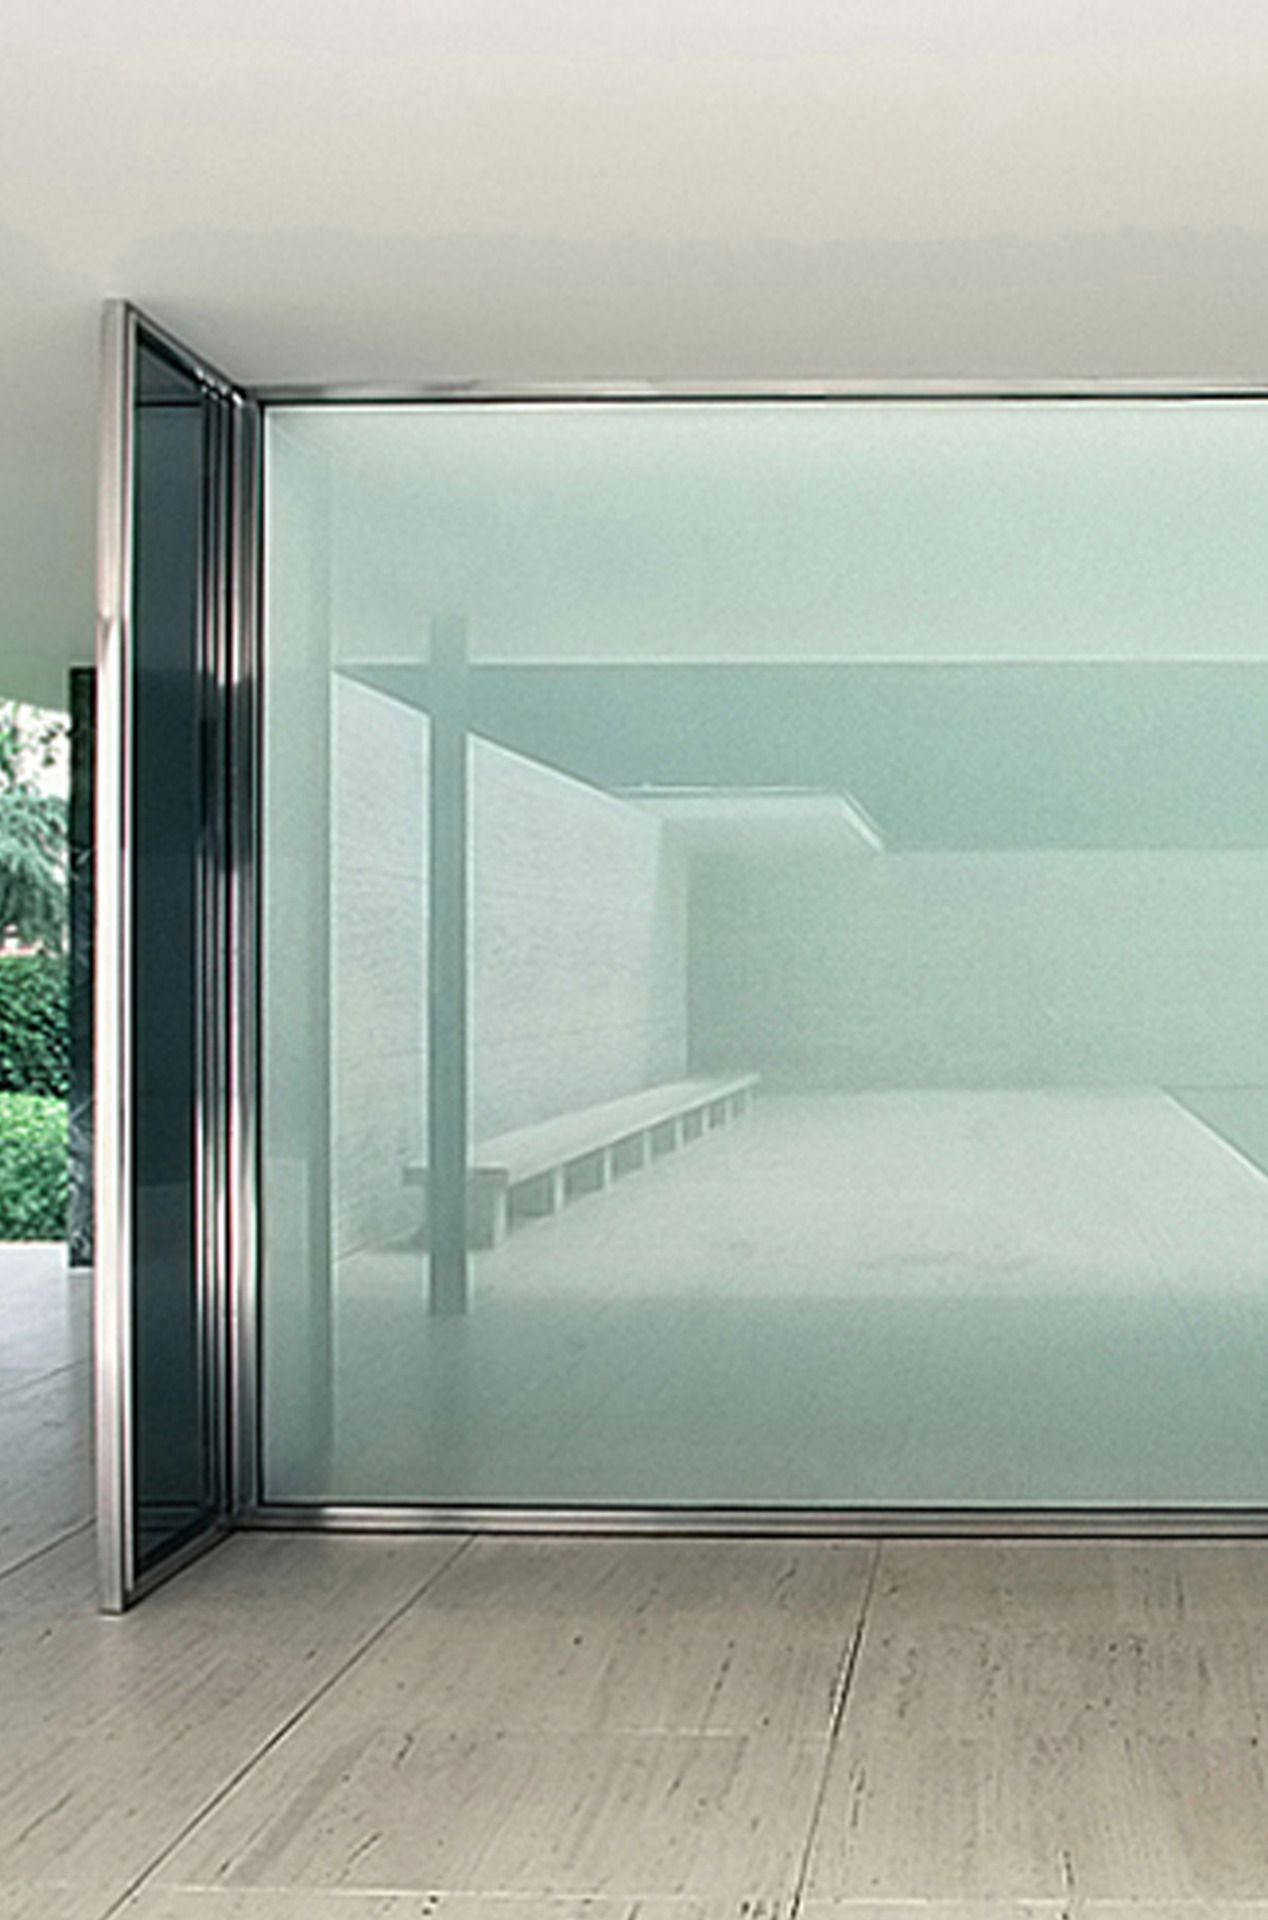 Barcelona Pavilion by Ludiwg Mies van der Rohe | Modernist ...